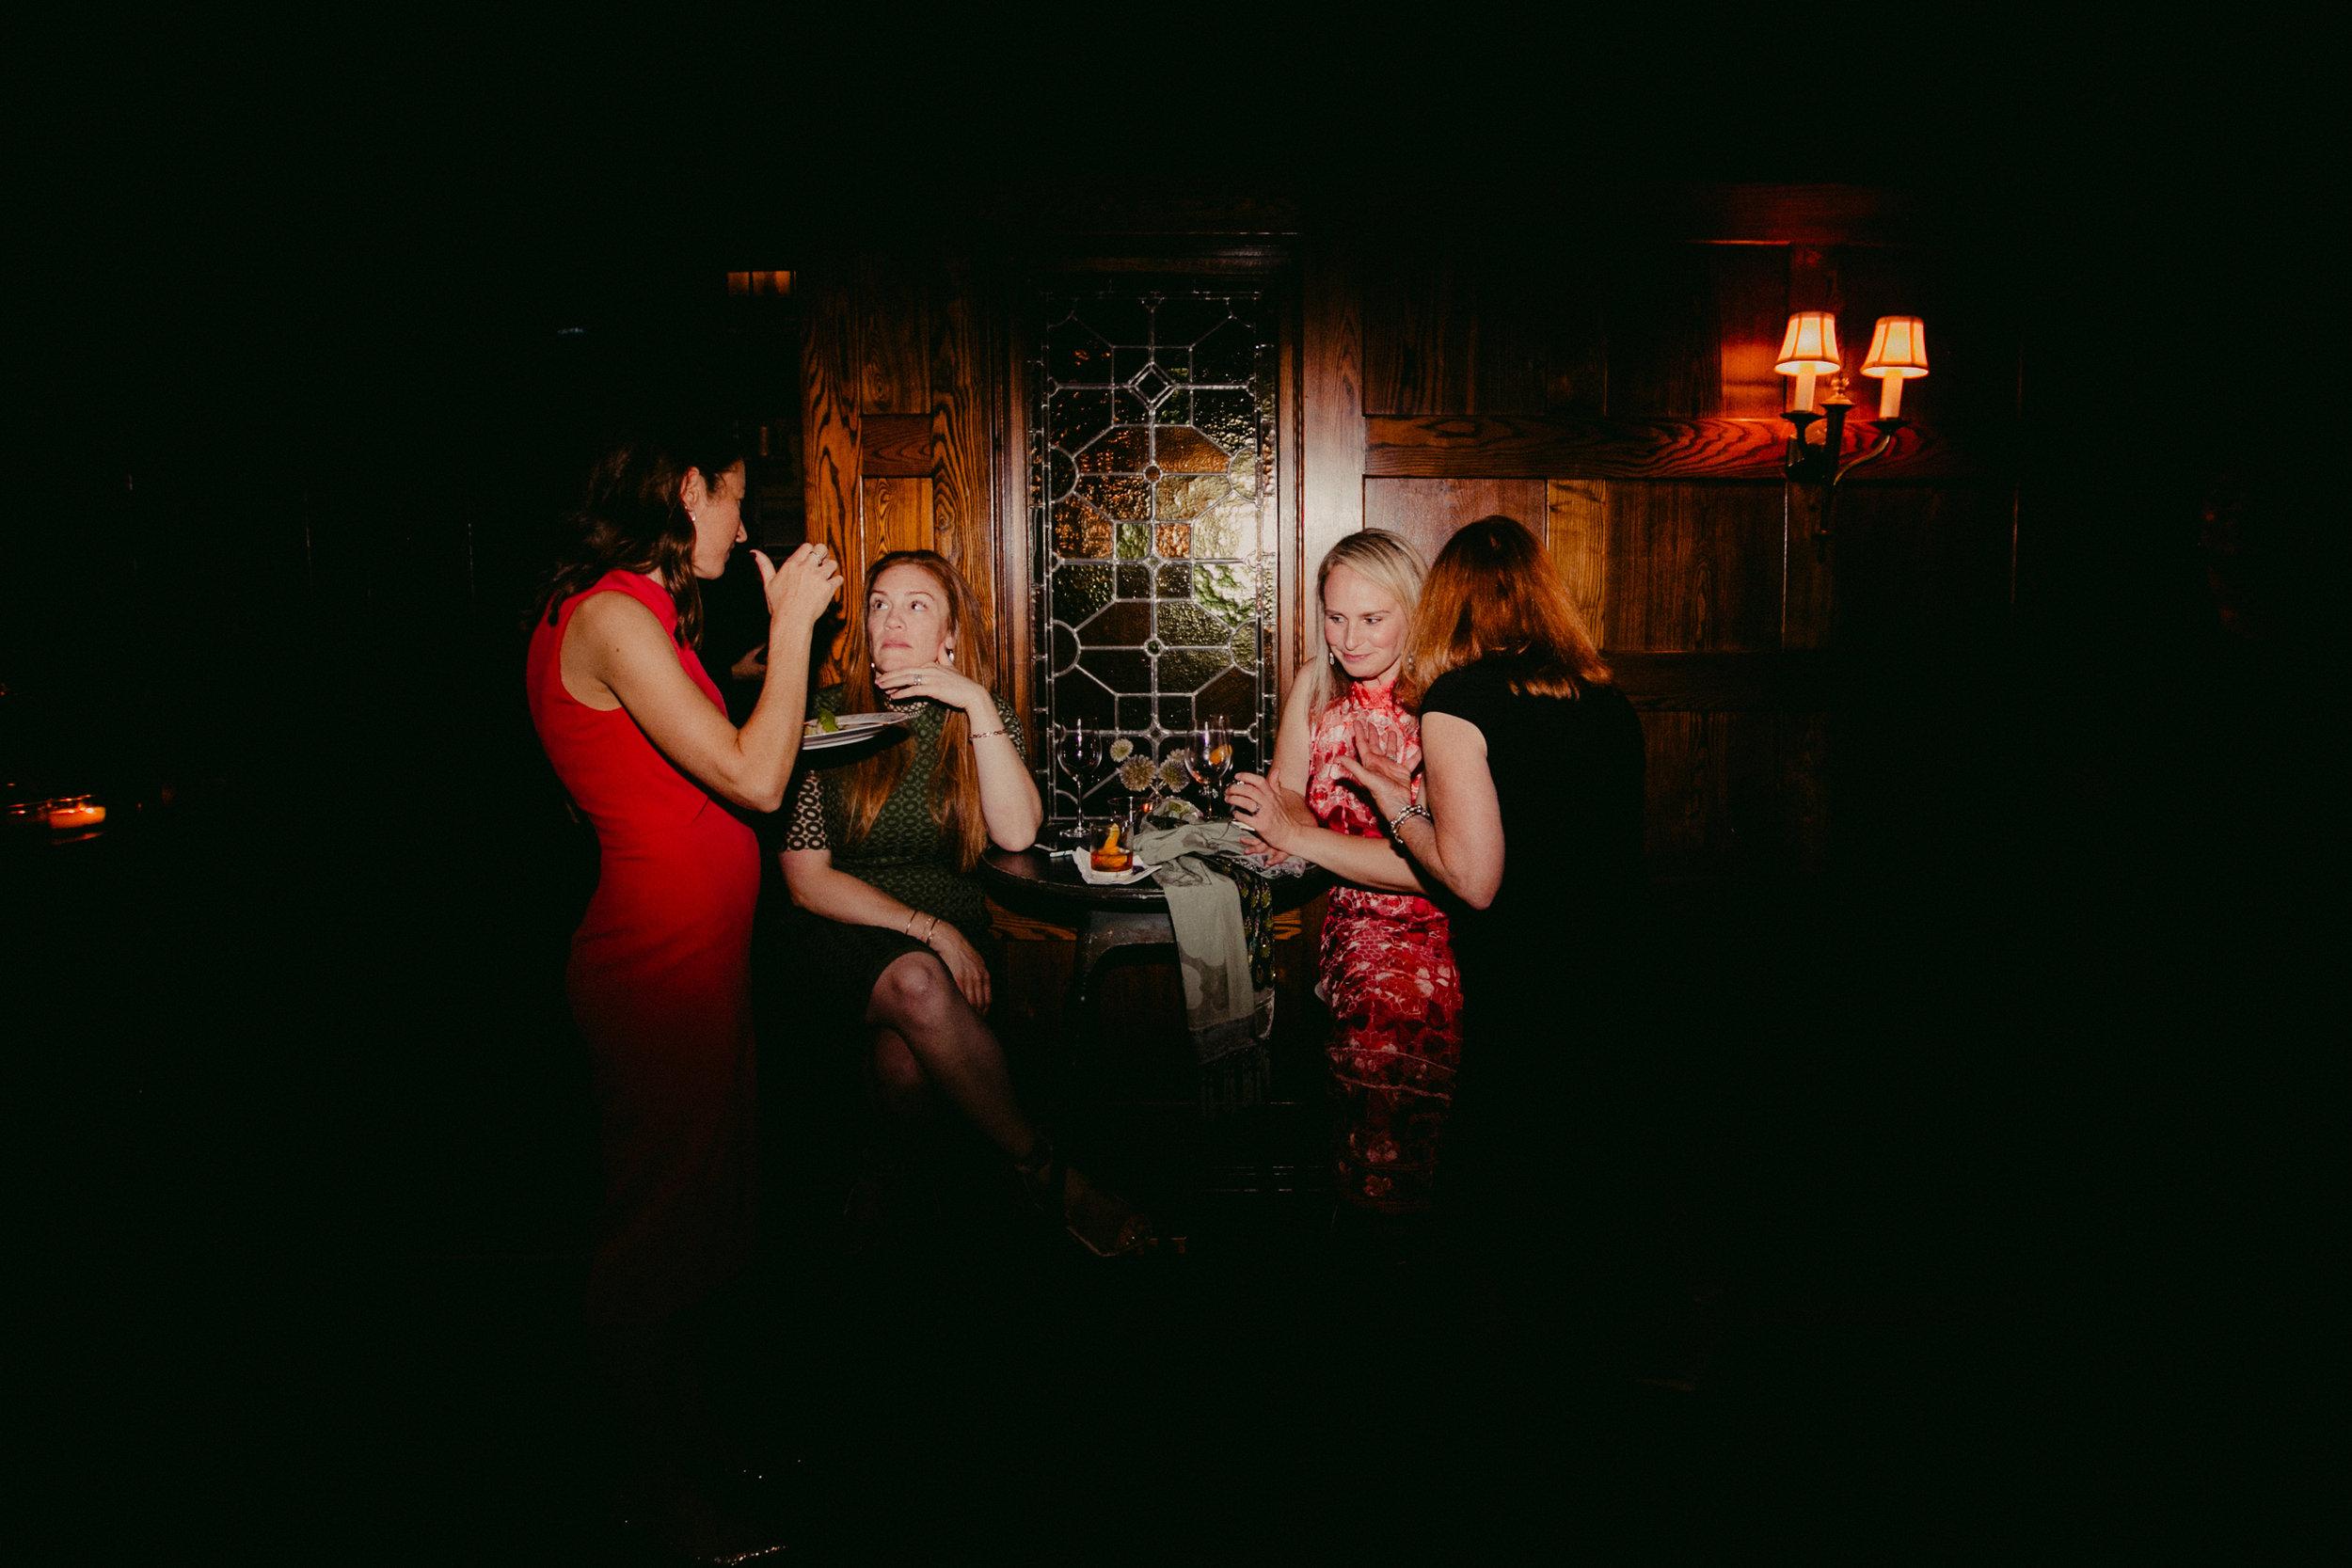 Tiger_House_The_Inn_at_Hudson-Wedding_Chellise_Michael_Photography-432.jpg